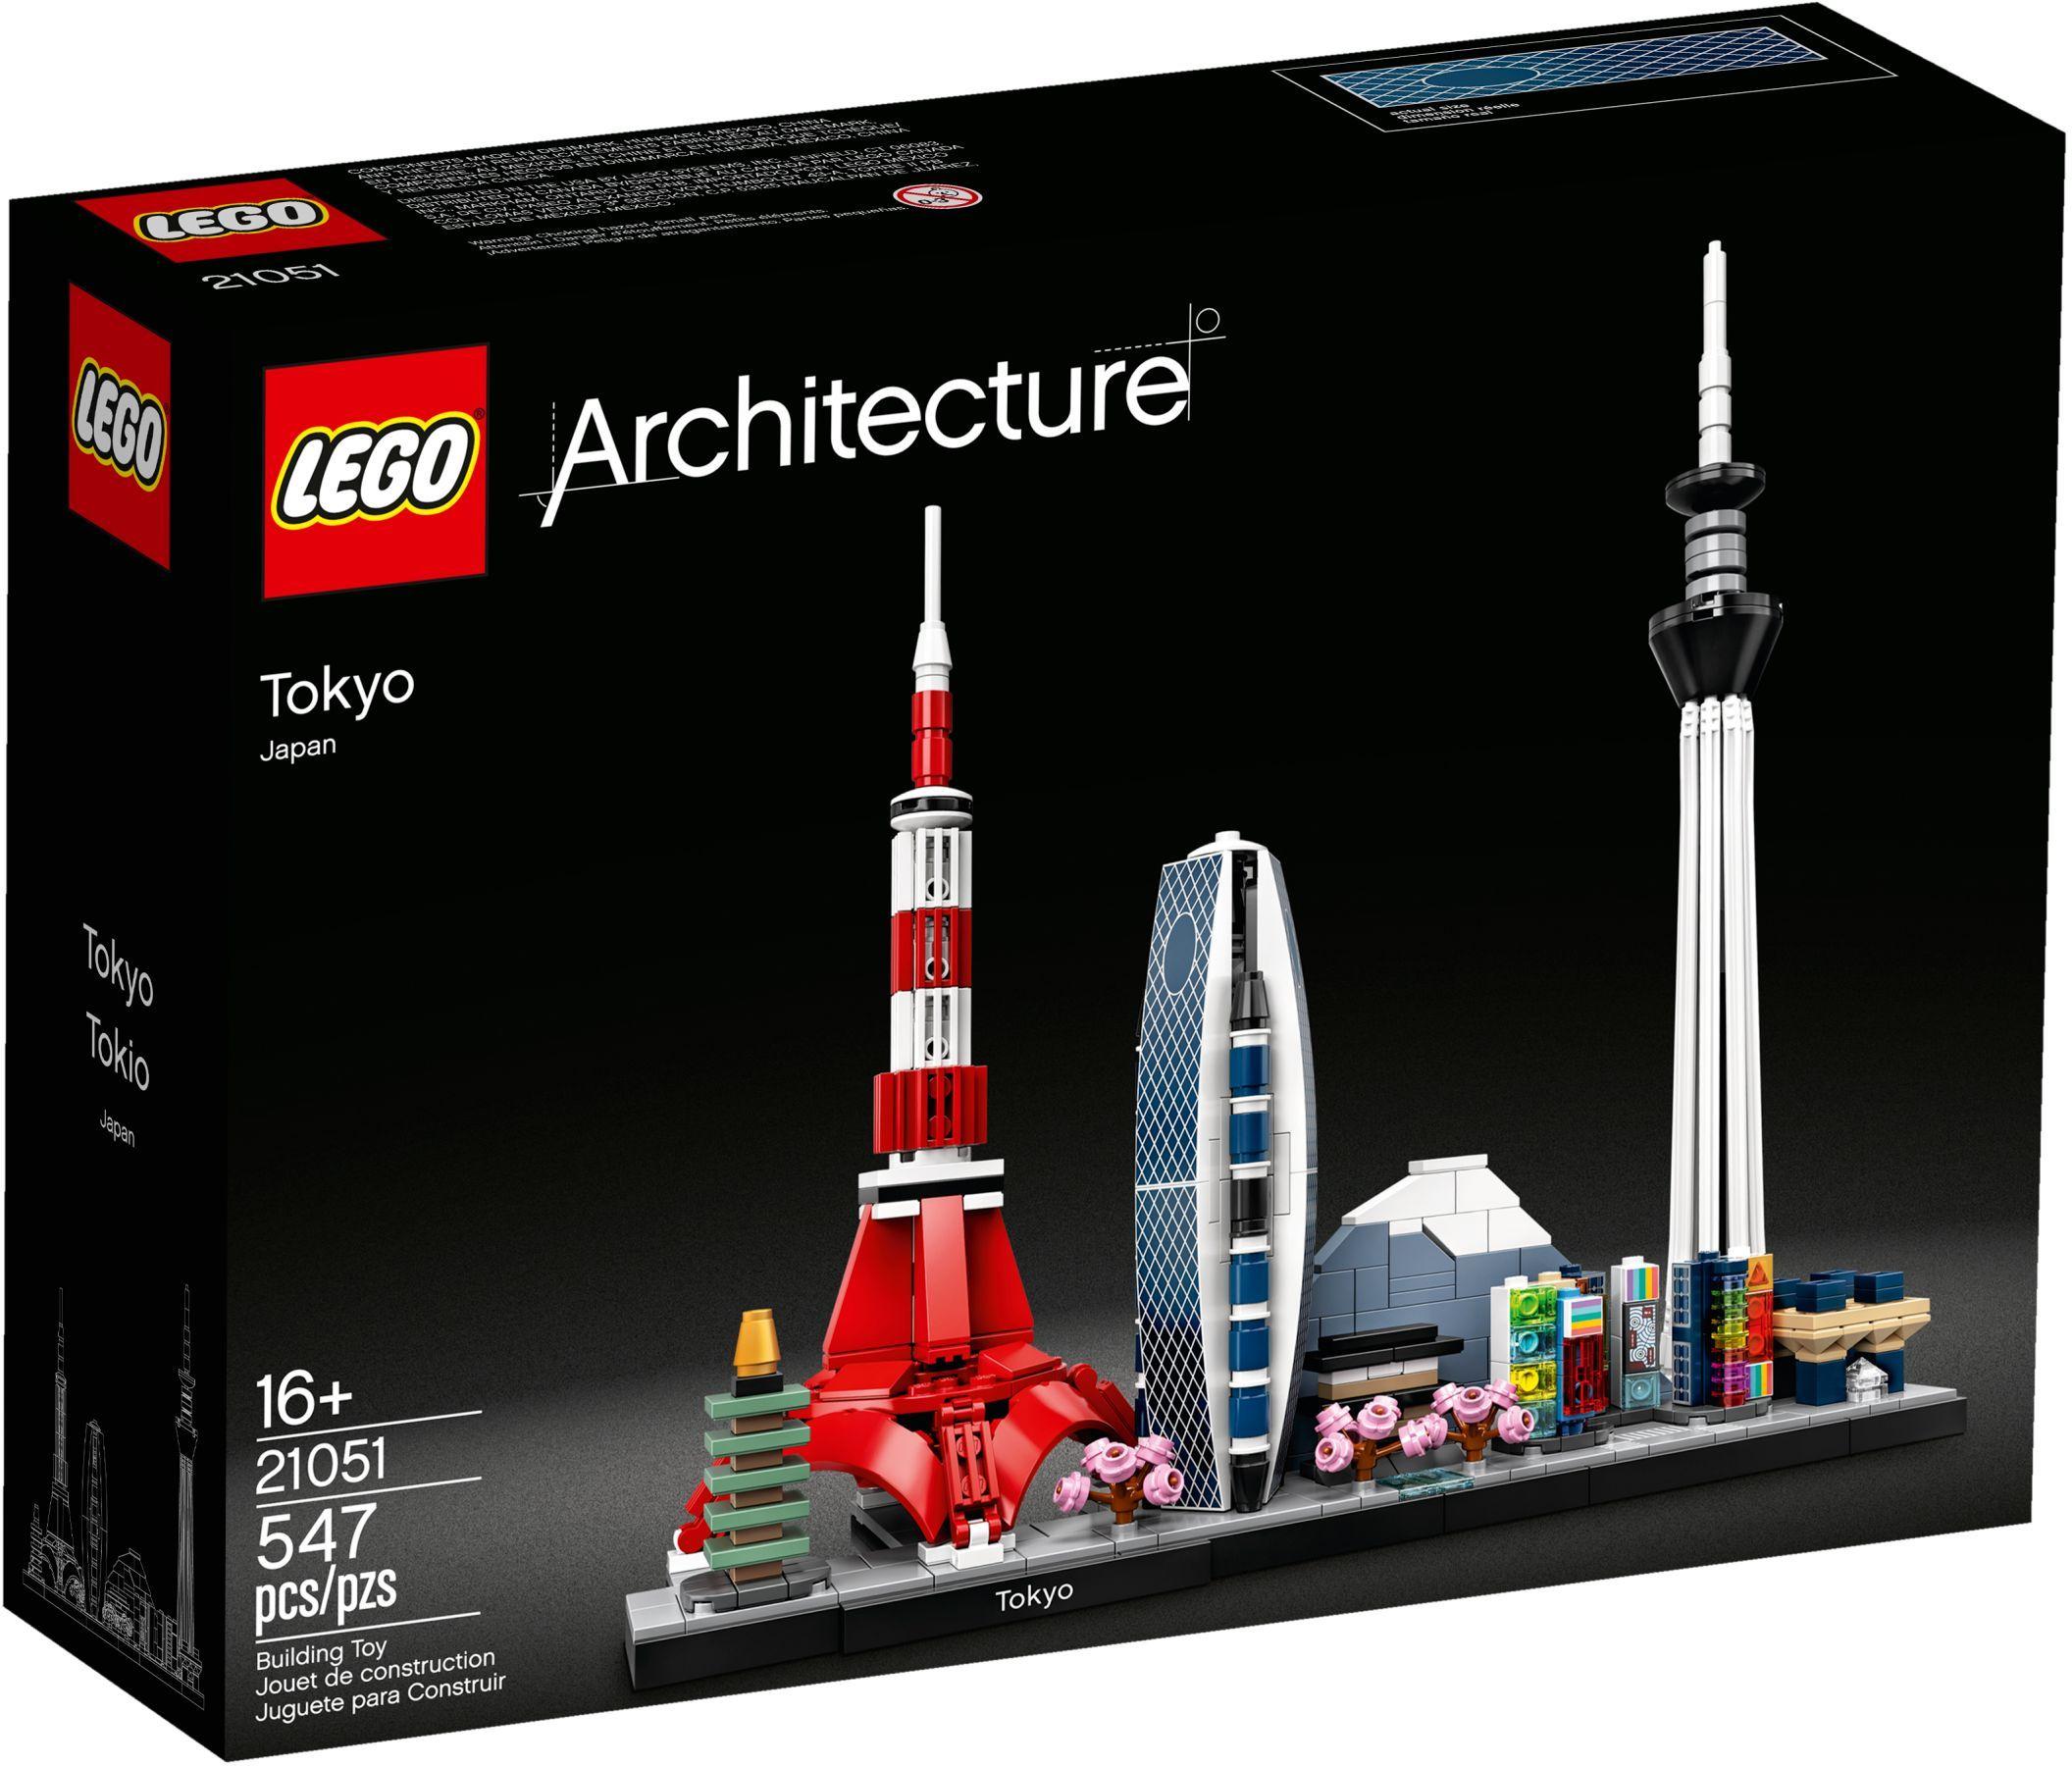 LEGO Architecture - Tokyo (21051)